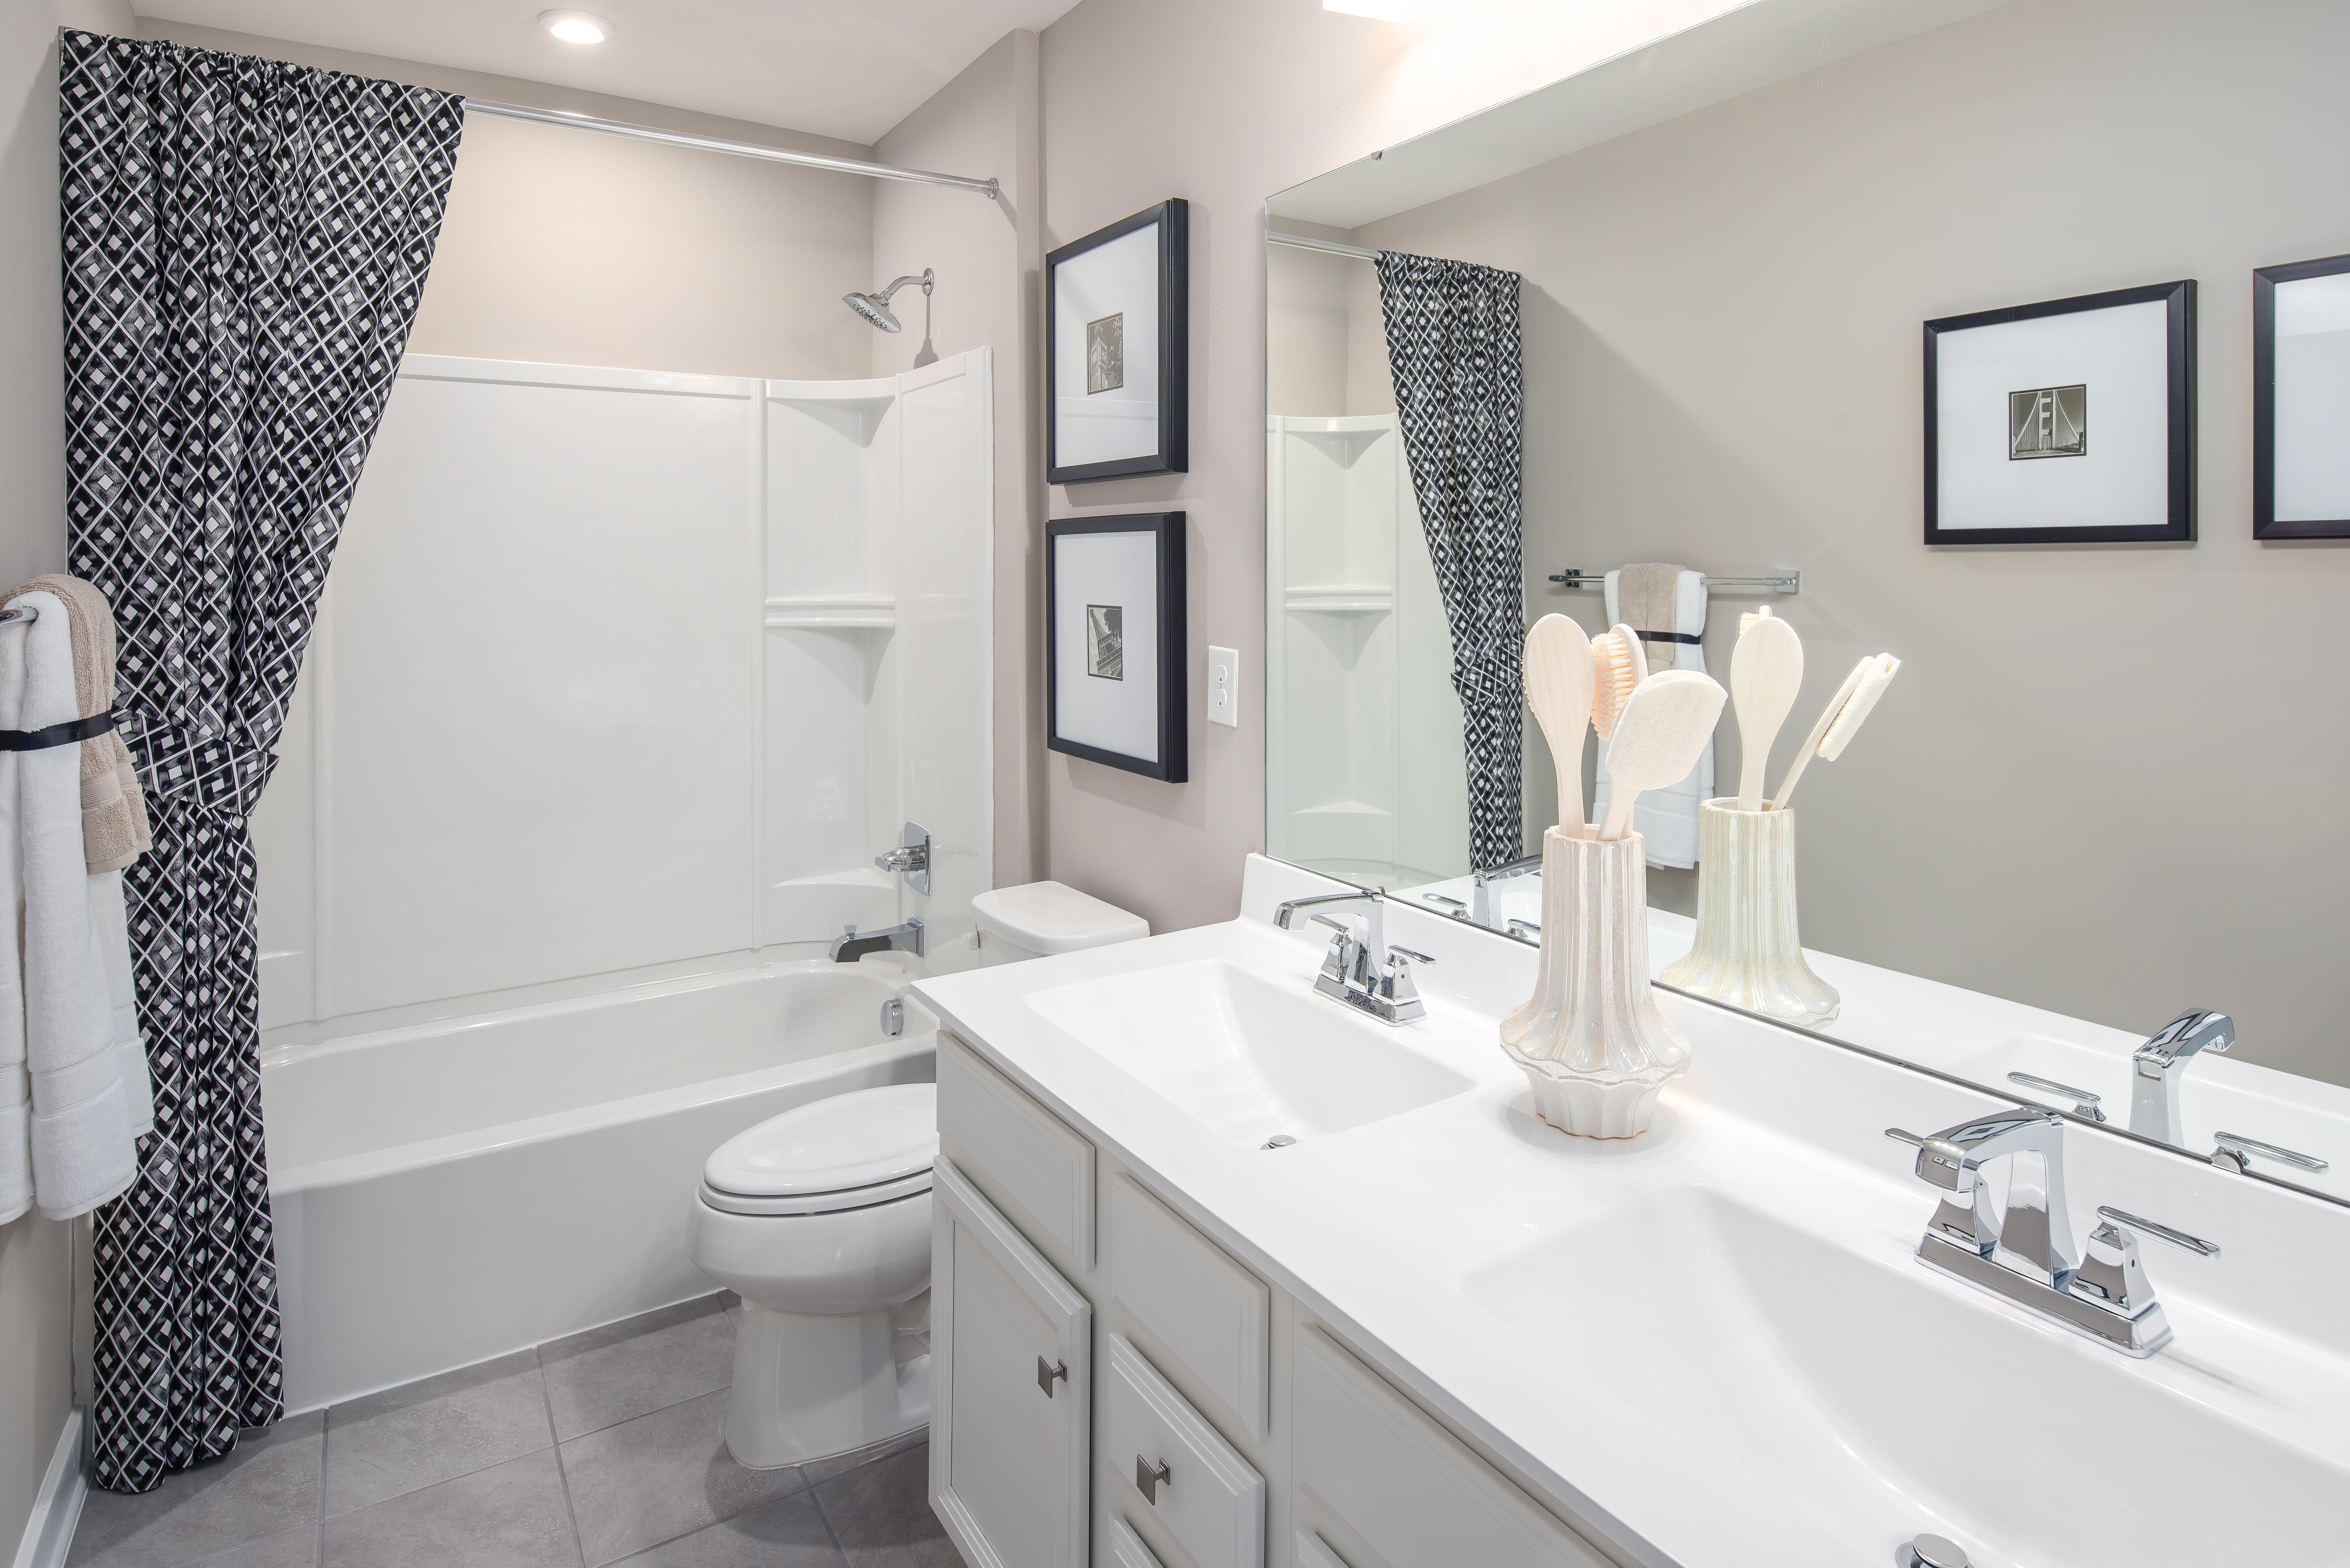 Bathroom featured in the Hudson By HeartlandHomes in Morgantown, WV